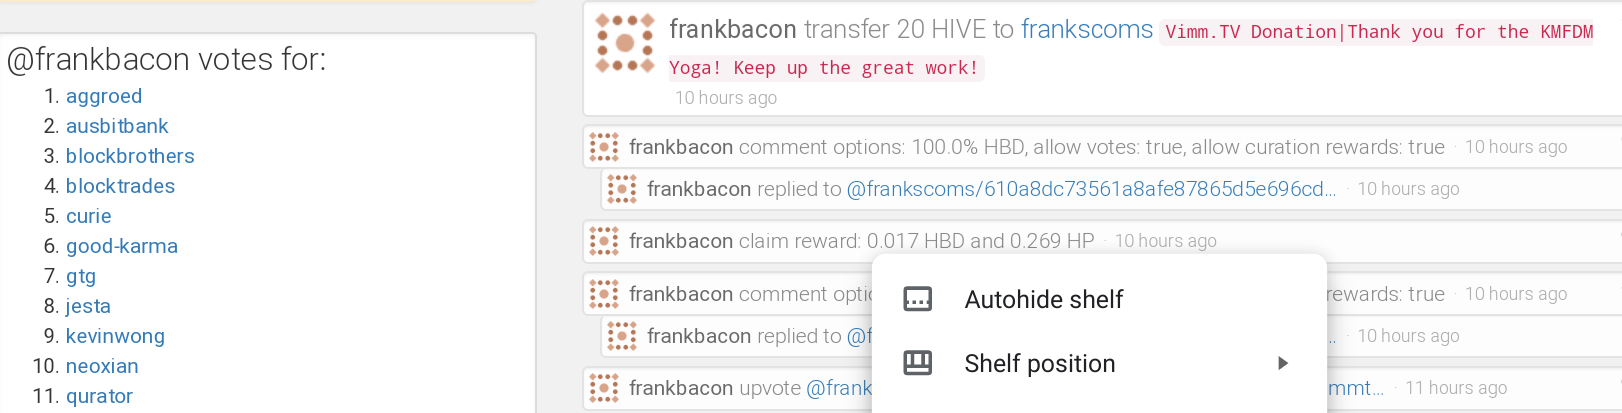 @frankbacon votes for Yoga.png